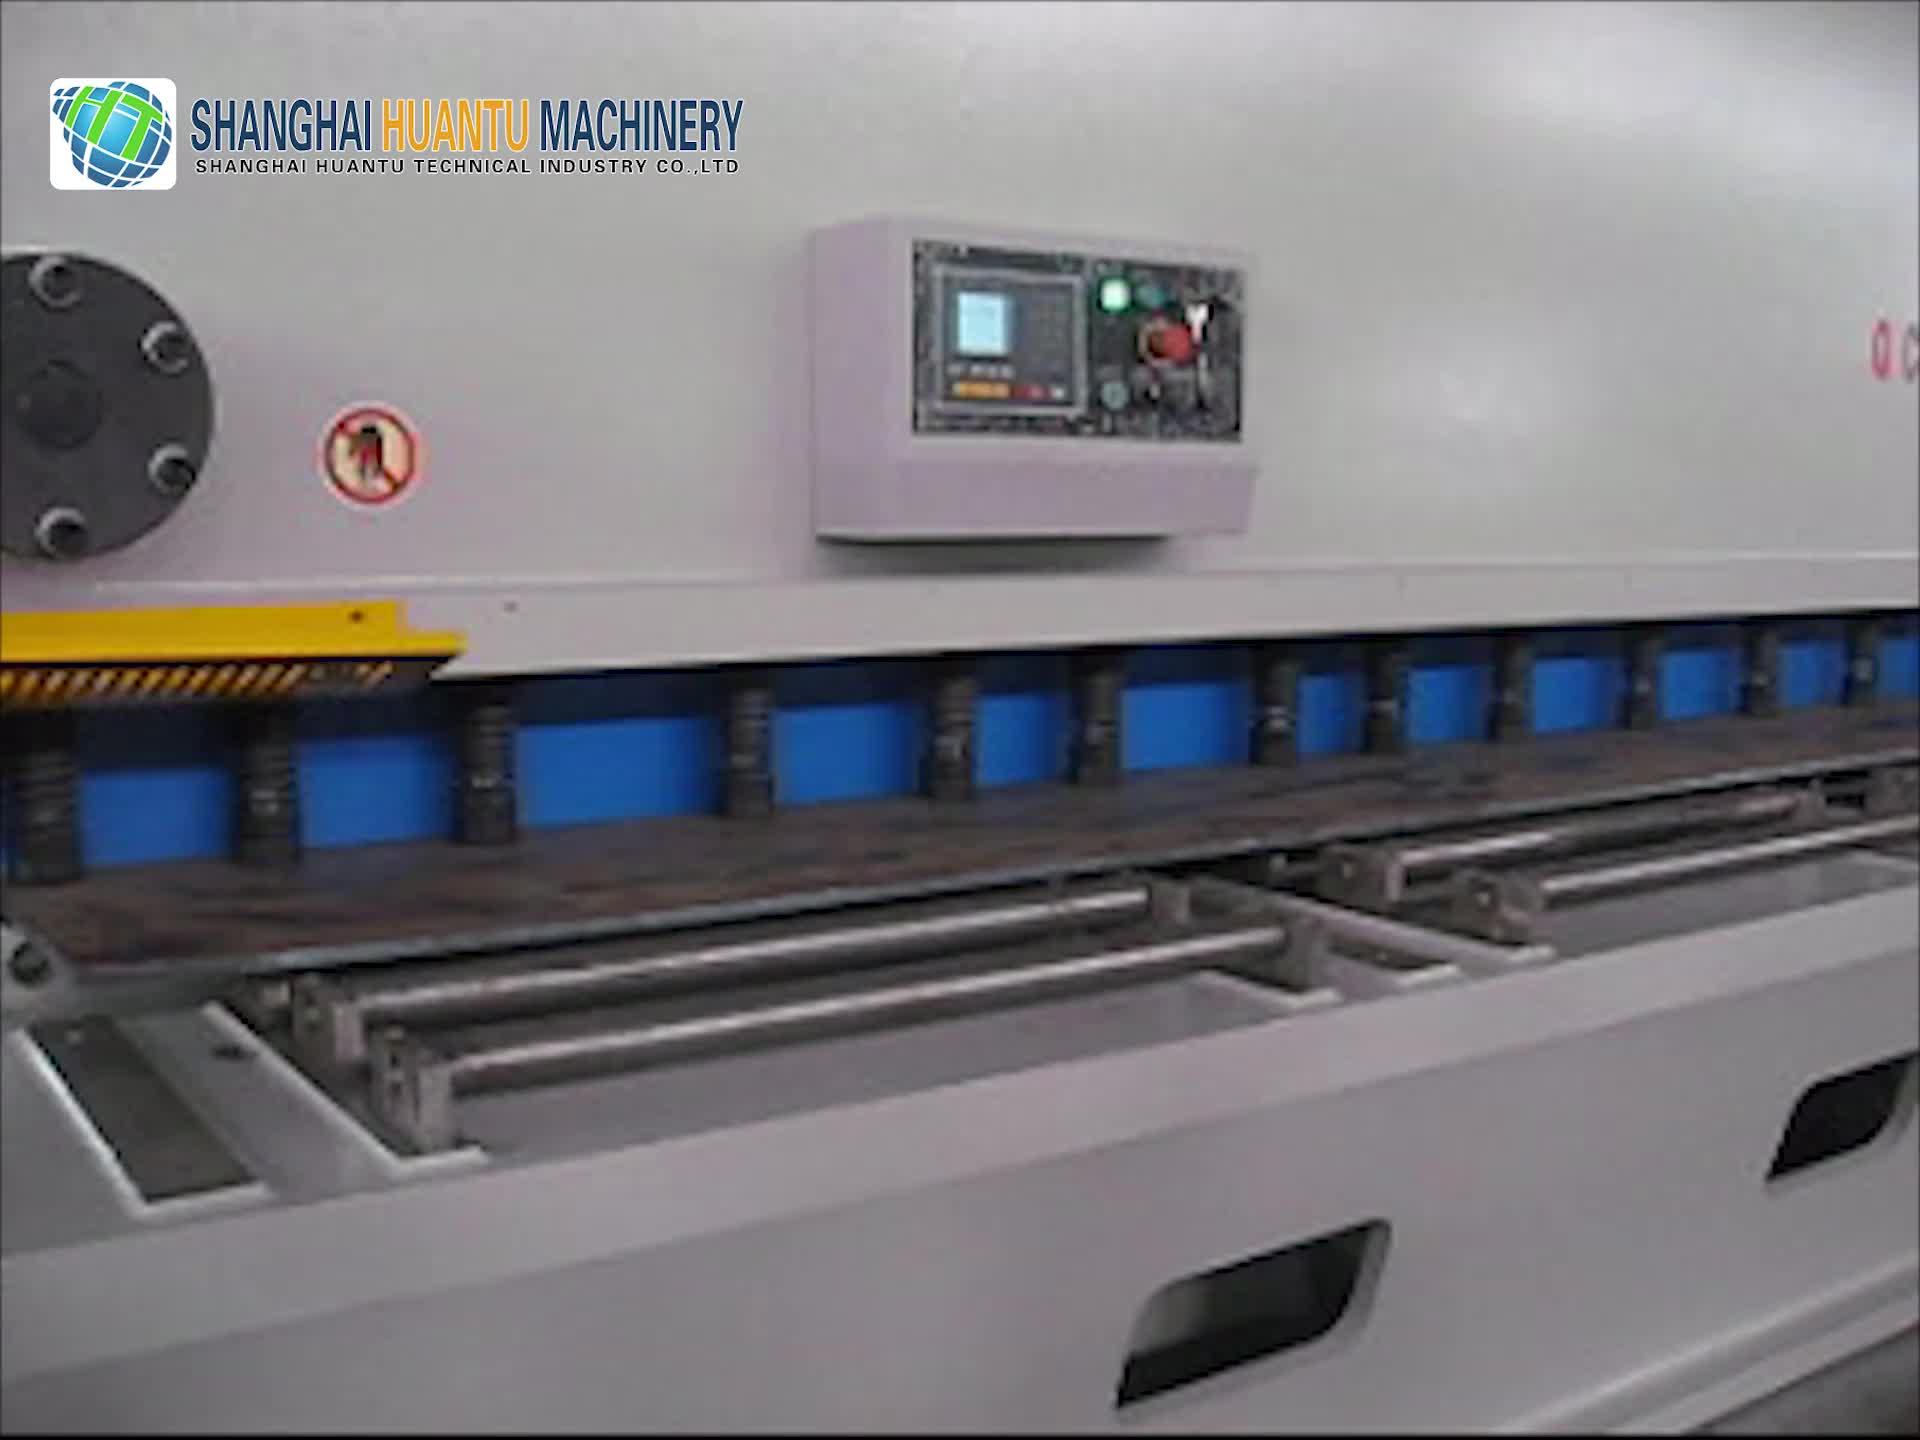 Avrupa standart paslanmaz çelik levha kesme makinesi/demir plaka sac kesme makinesi/giyotin kesme makinesi